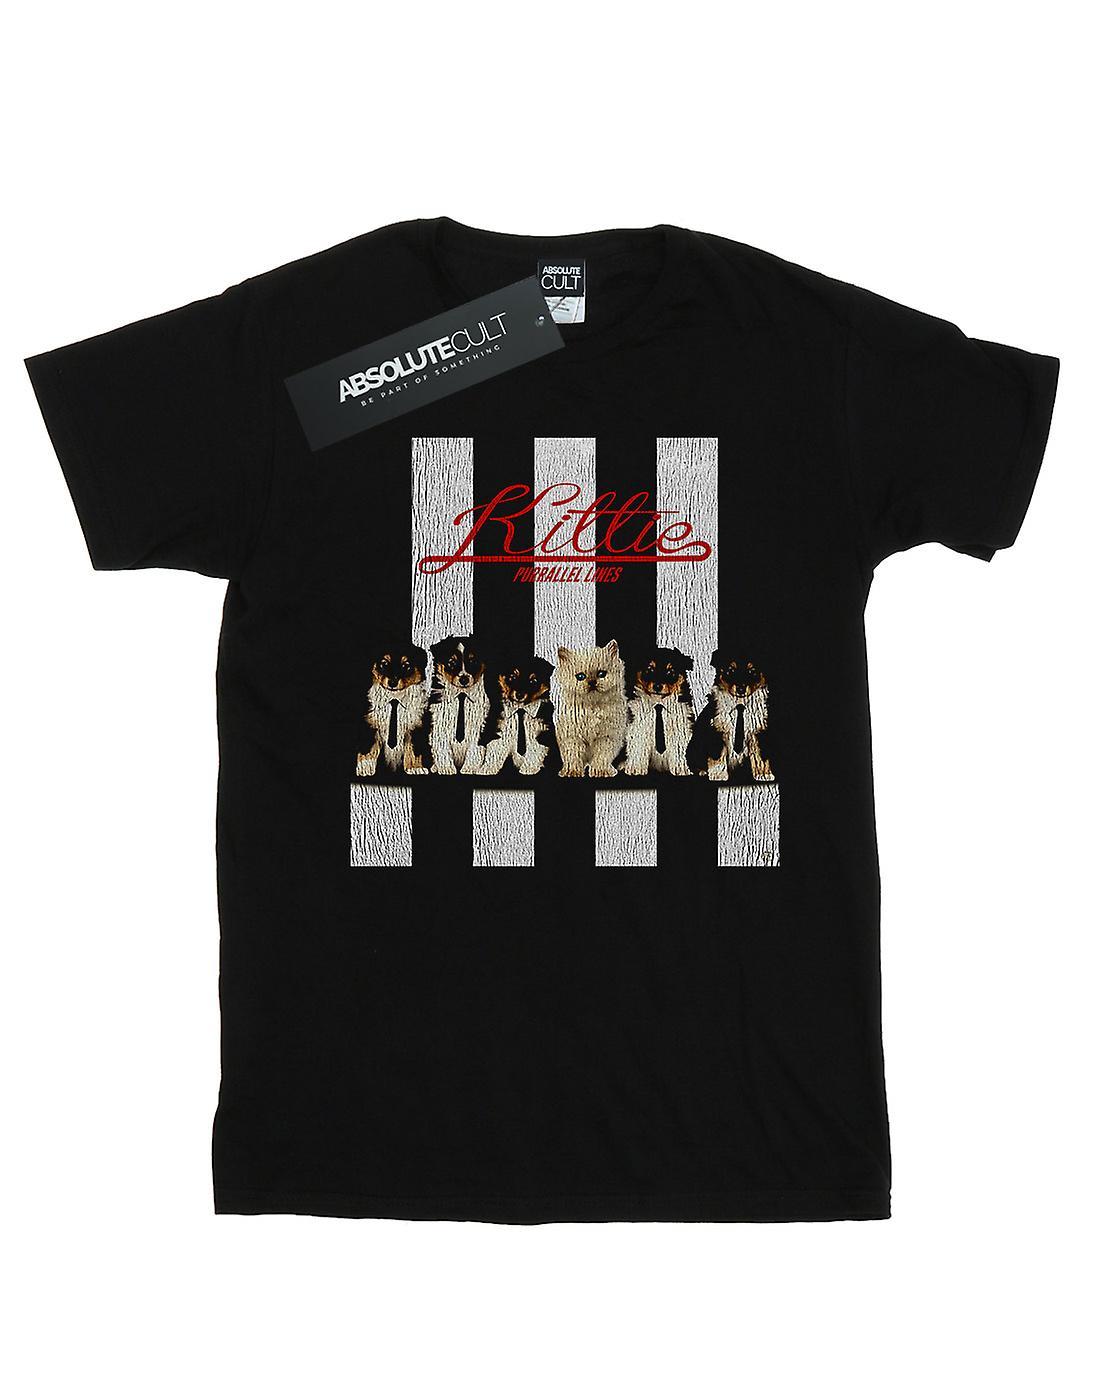 Blondie Men's Kitty Purrallel Lines T-Shirt